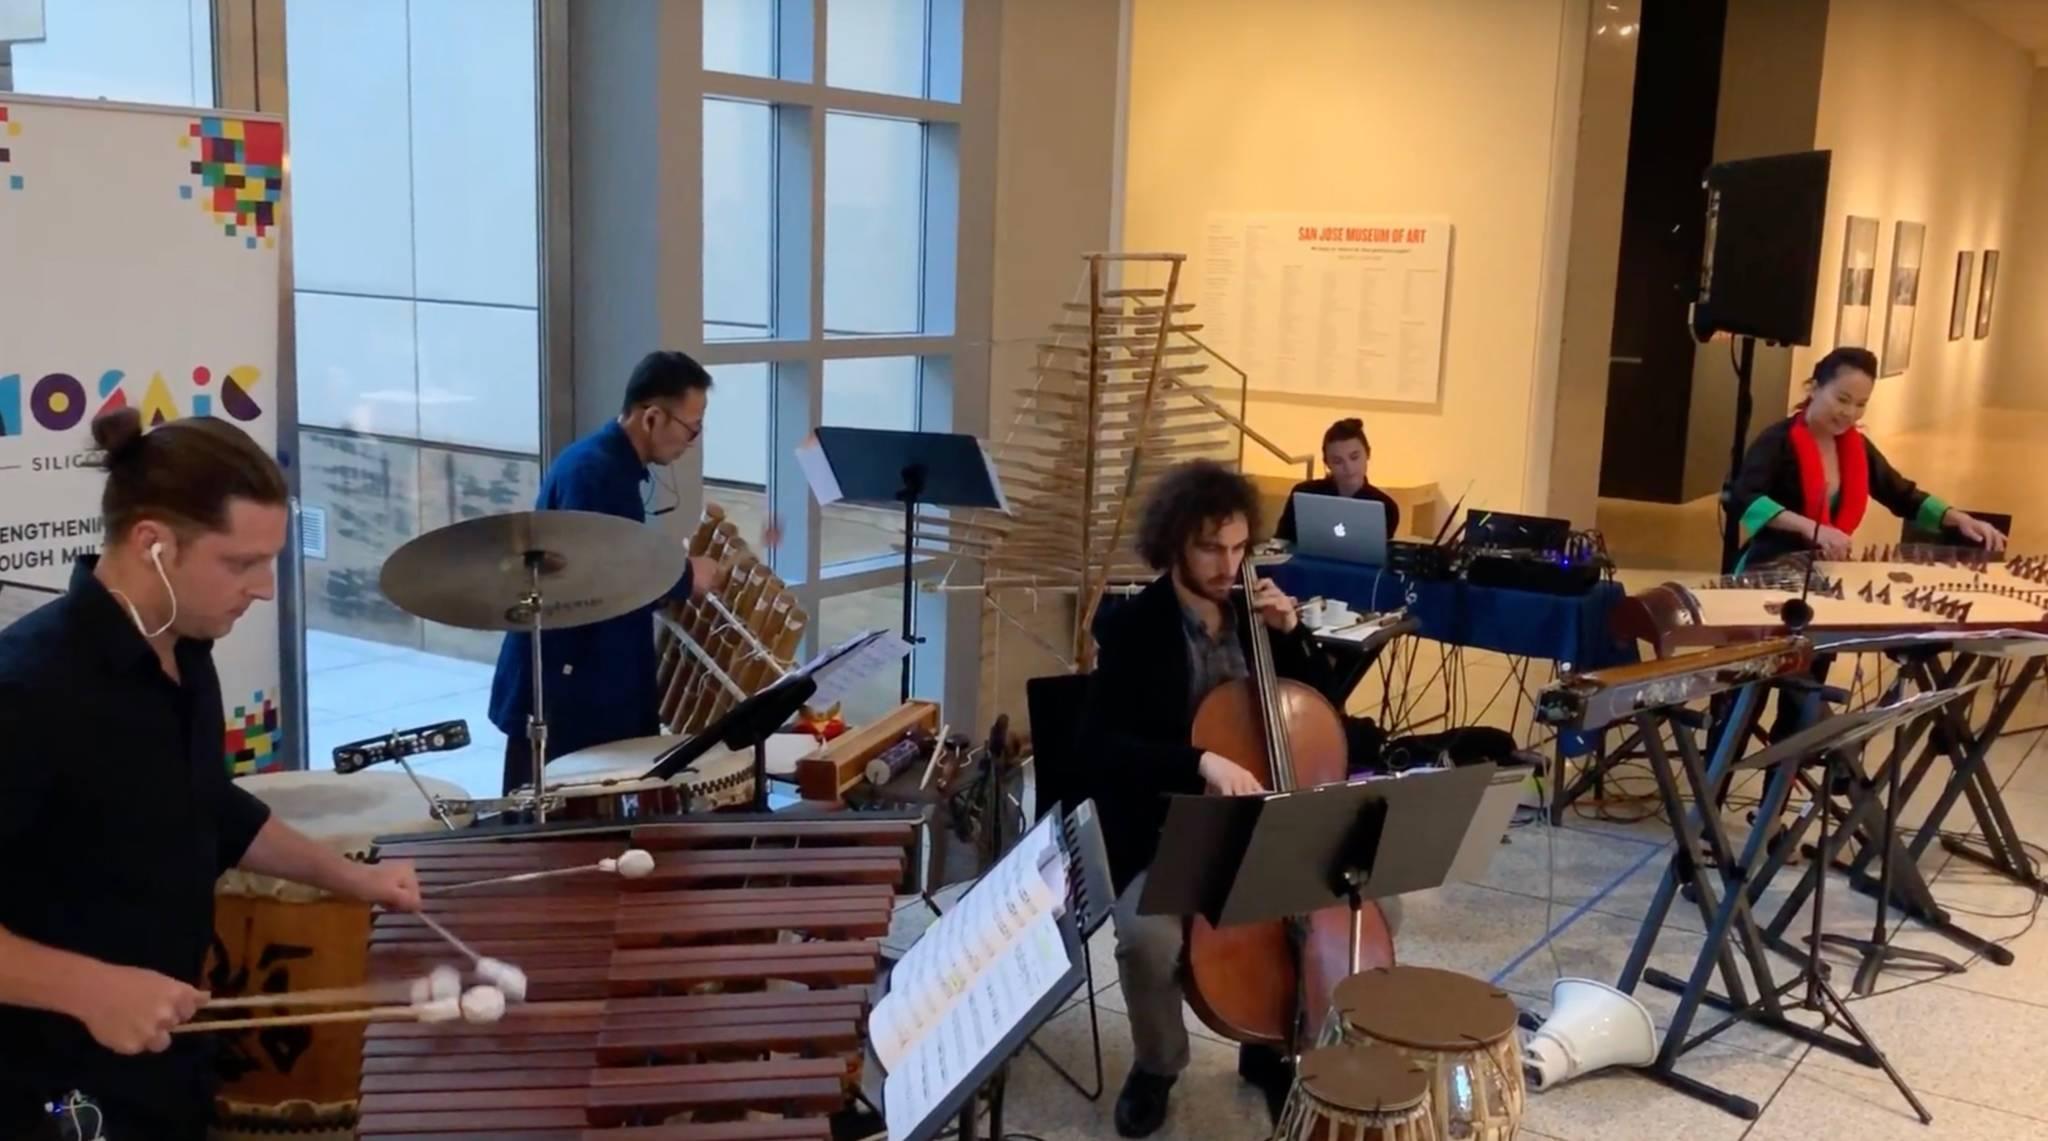 From left to right:Mikhael Khalikulov (cello, viola, electric bass) , Jimi Nakagawa (taiko, percussion), Joshua Mellinger (frame drum, trap set, tabla, marimba), Megan Ai, Vân-Ánh Võ (đàn tranh).